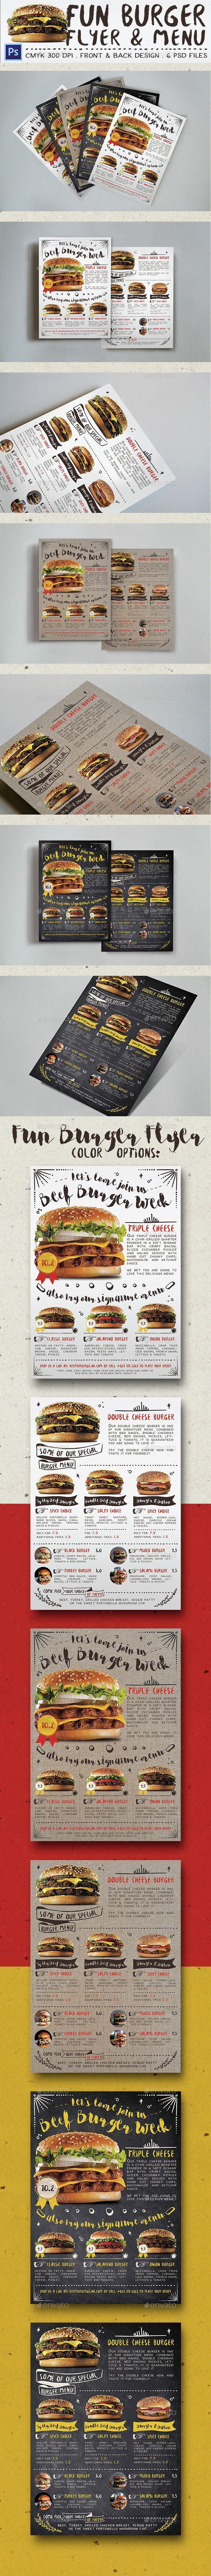 88 best contoh flyer menu cafe dan restoran images on pinterest fun burger flyer menu pronofoot35fo Image collections